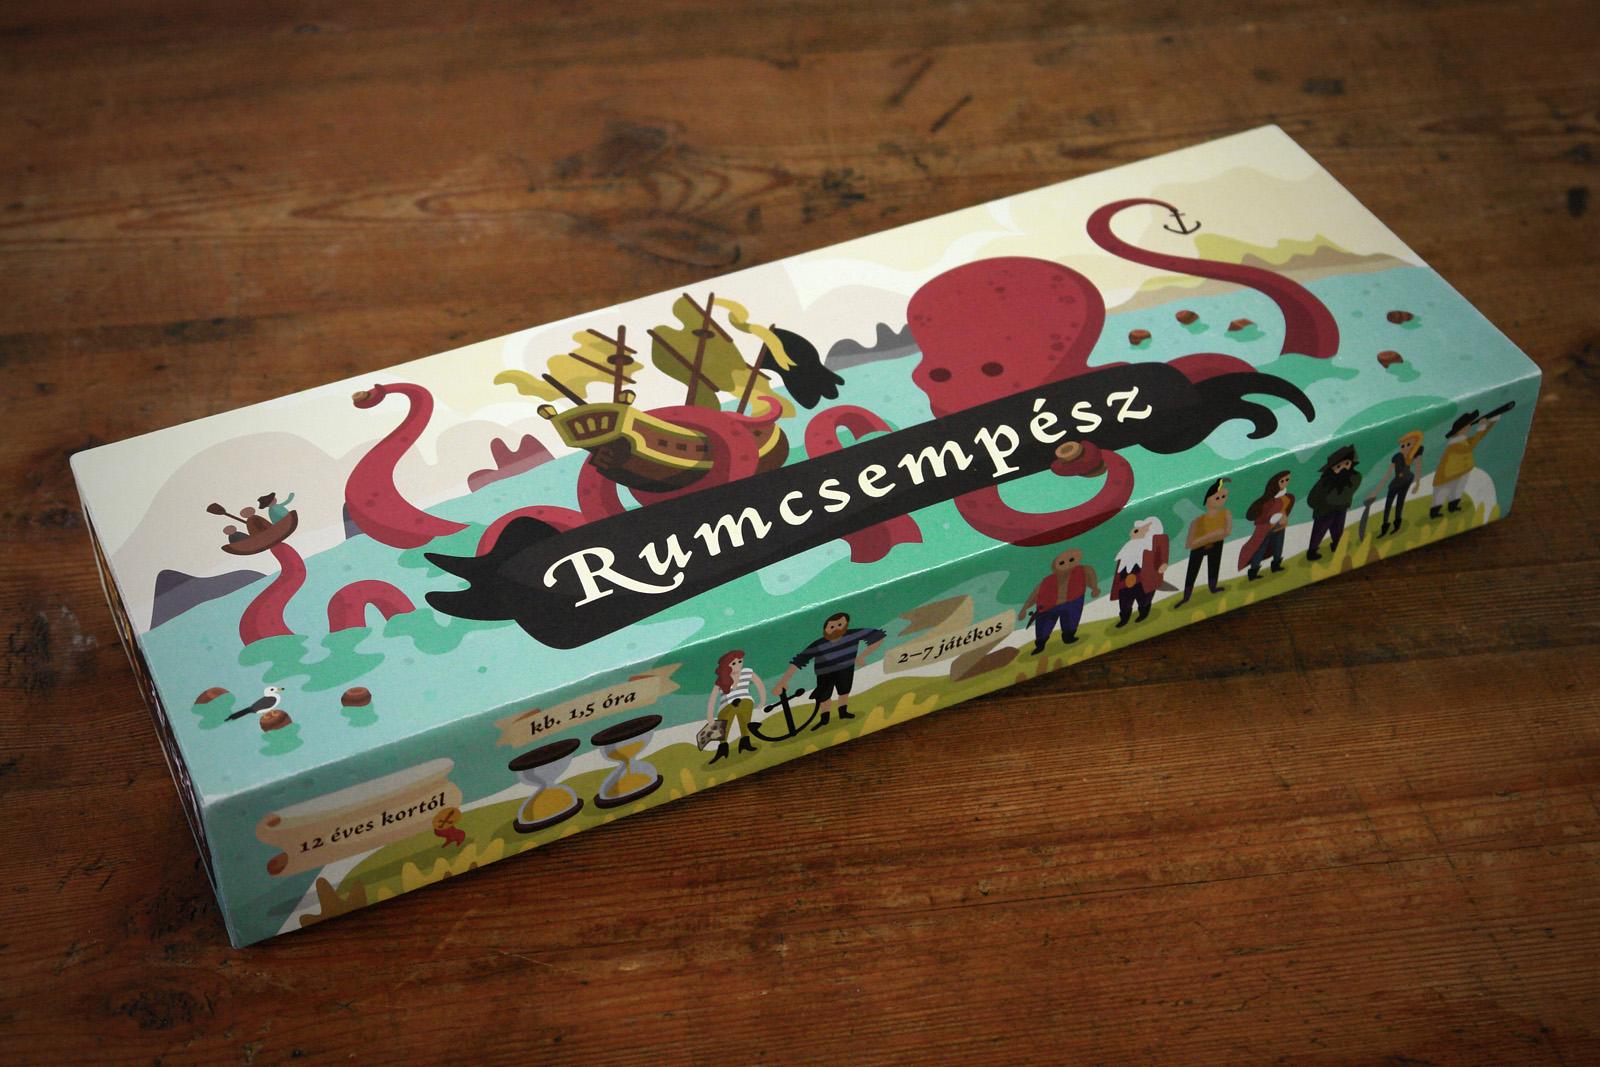 rumcsempesz_gilicze_001.jpg